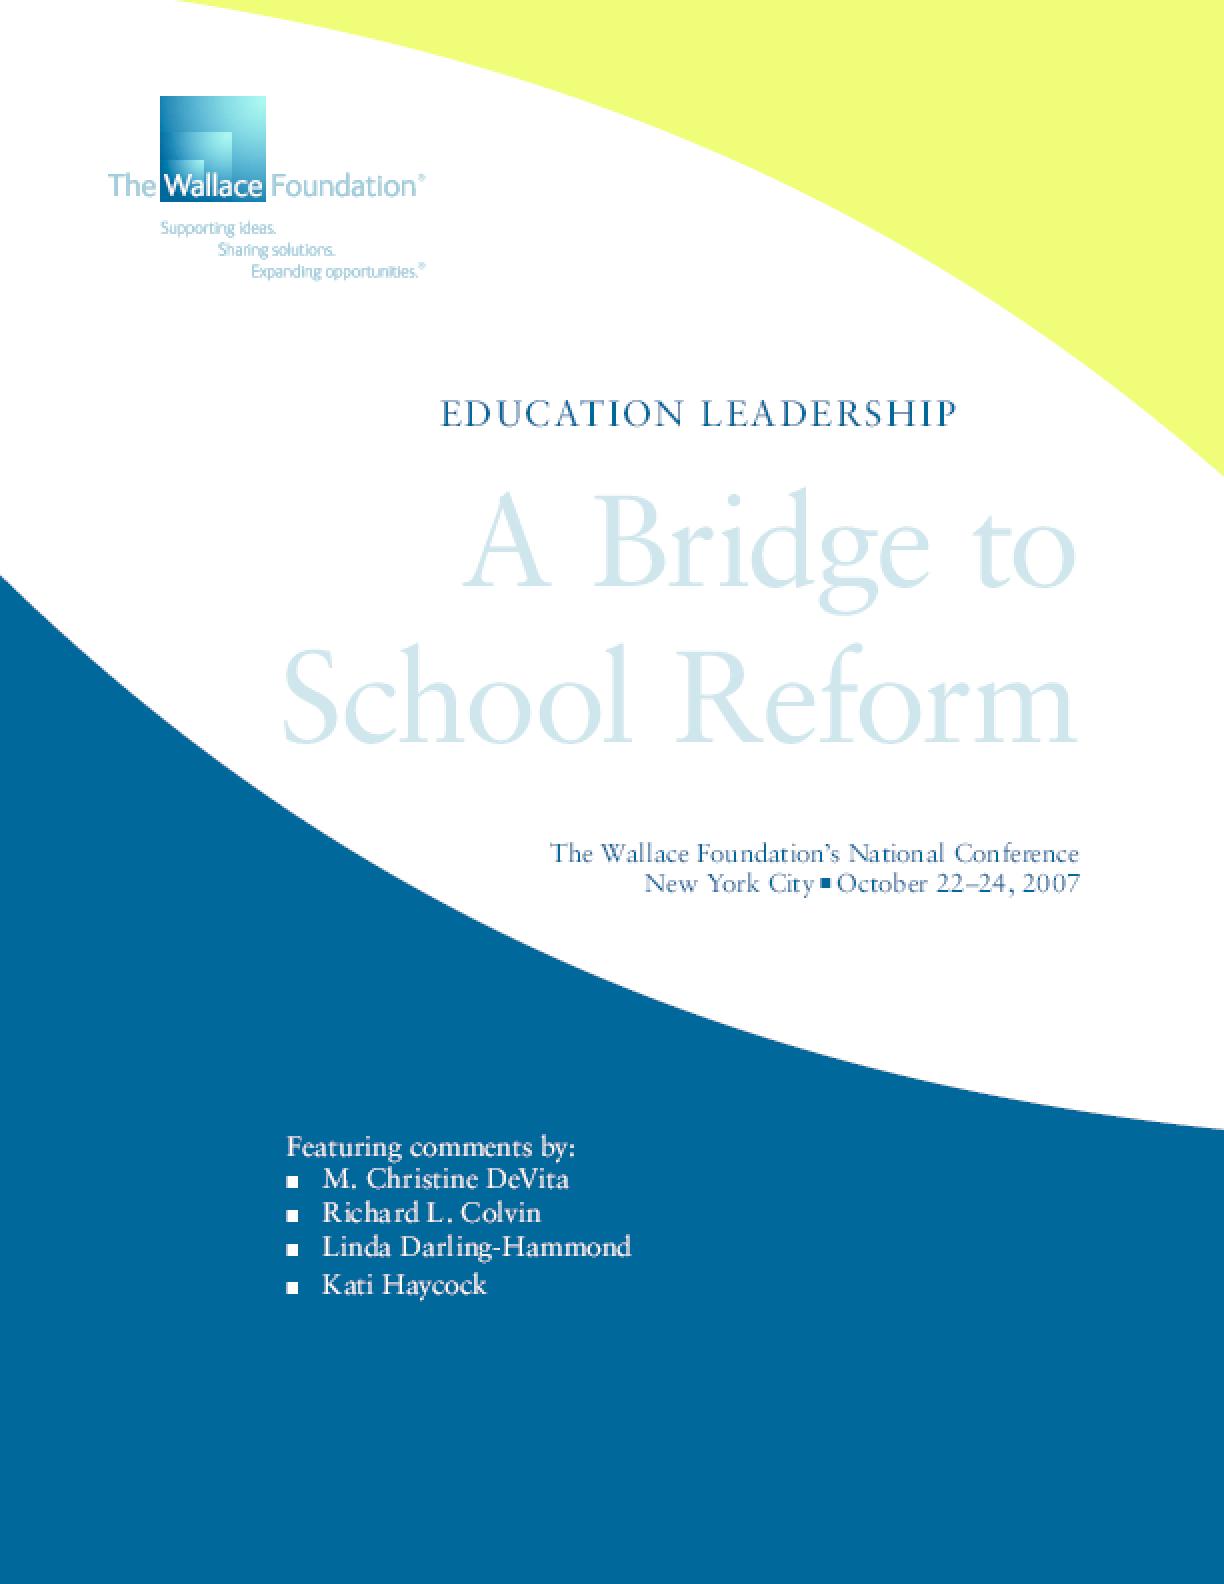 Education Leadership: A Bridge to School Reform